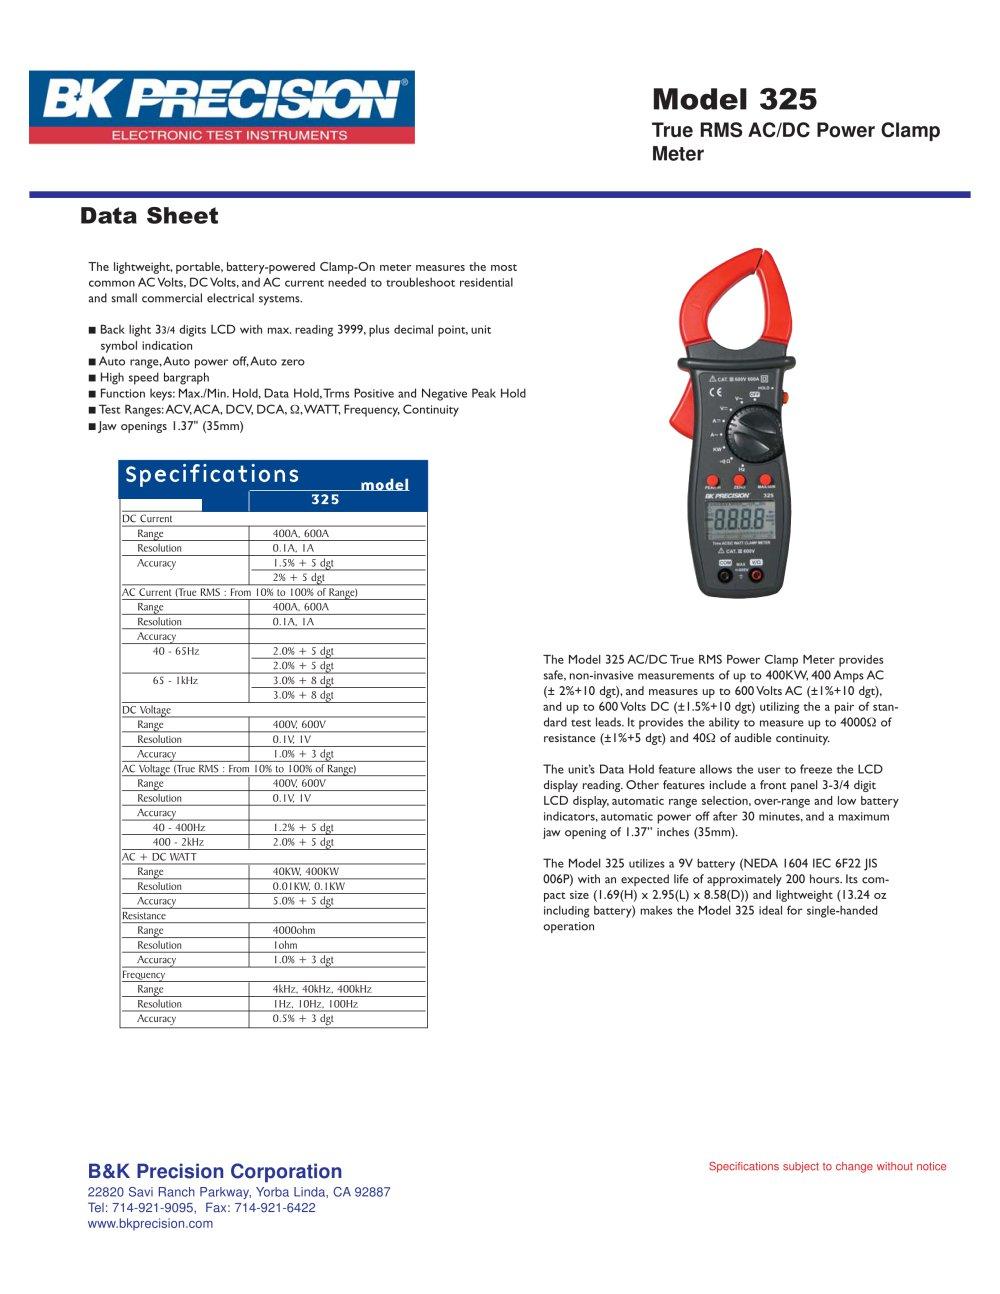 True Rms Ac Dc Power Clamp Meter B K Precision Pdf Catalogs